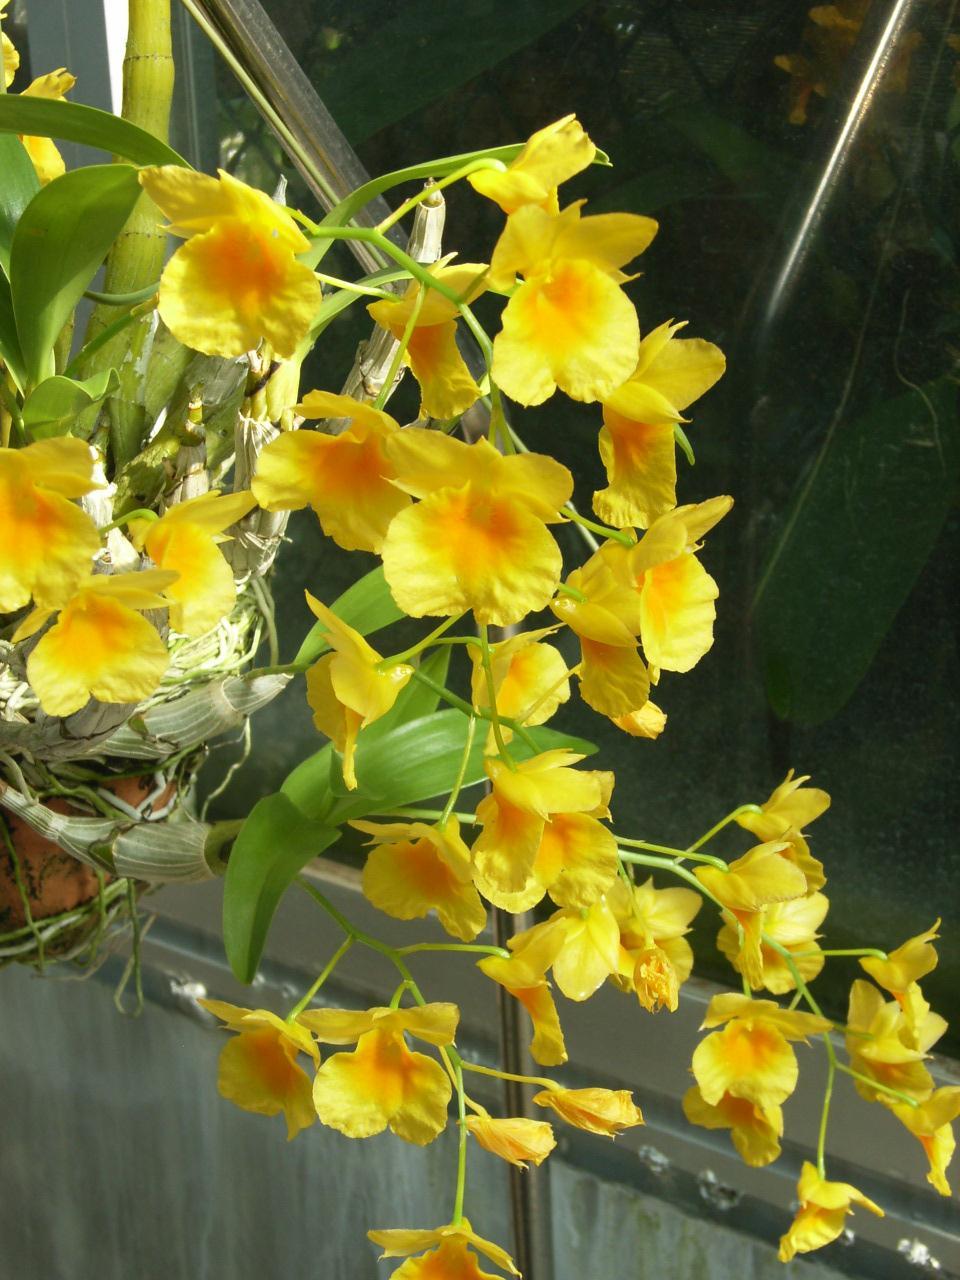 http://www7a.biglobe.ne.jp/~flower_world/images/200602/Dendrobium%20ejirii%20b.JPG